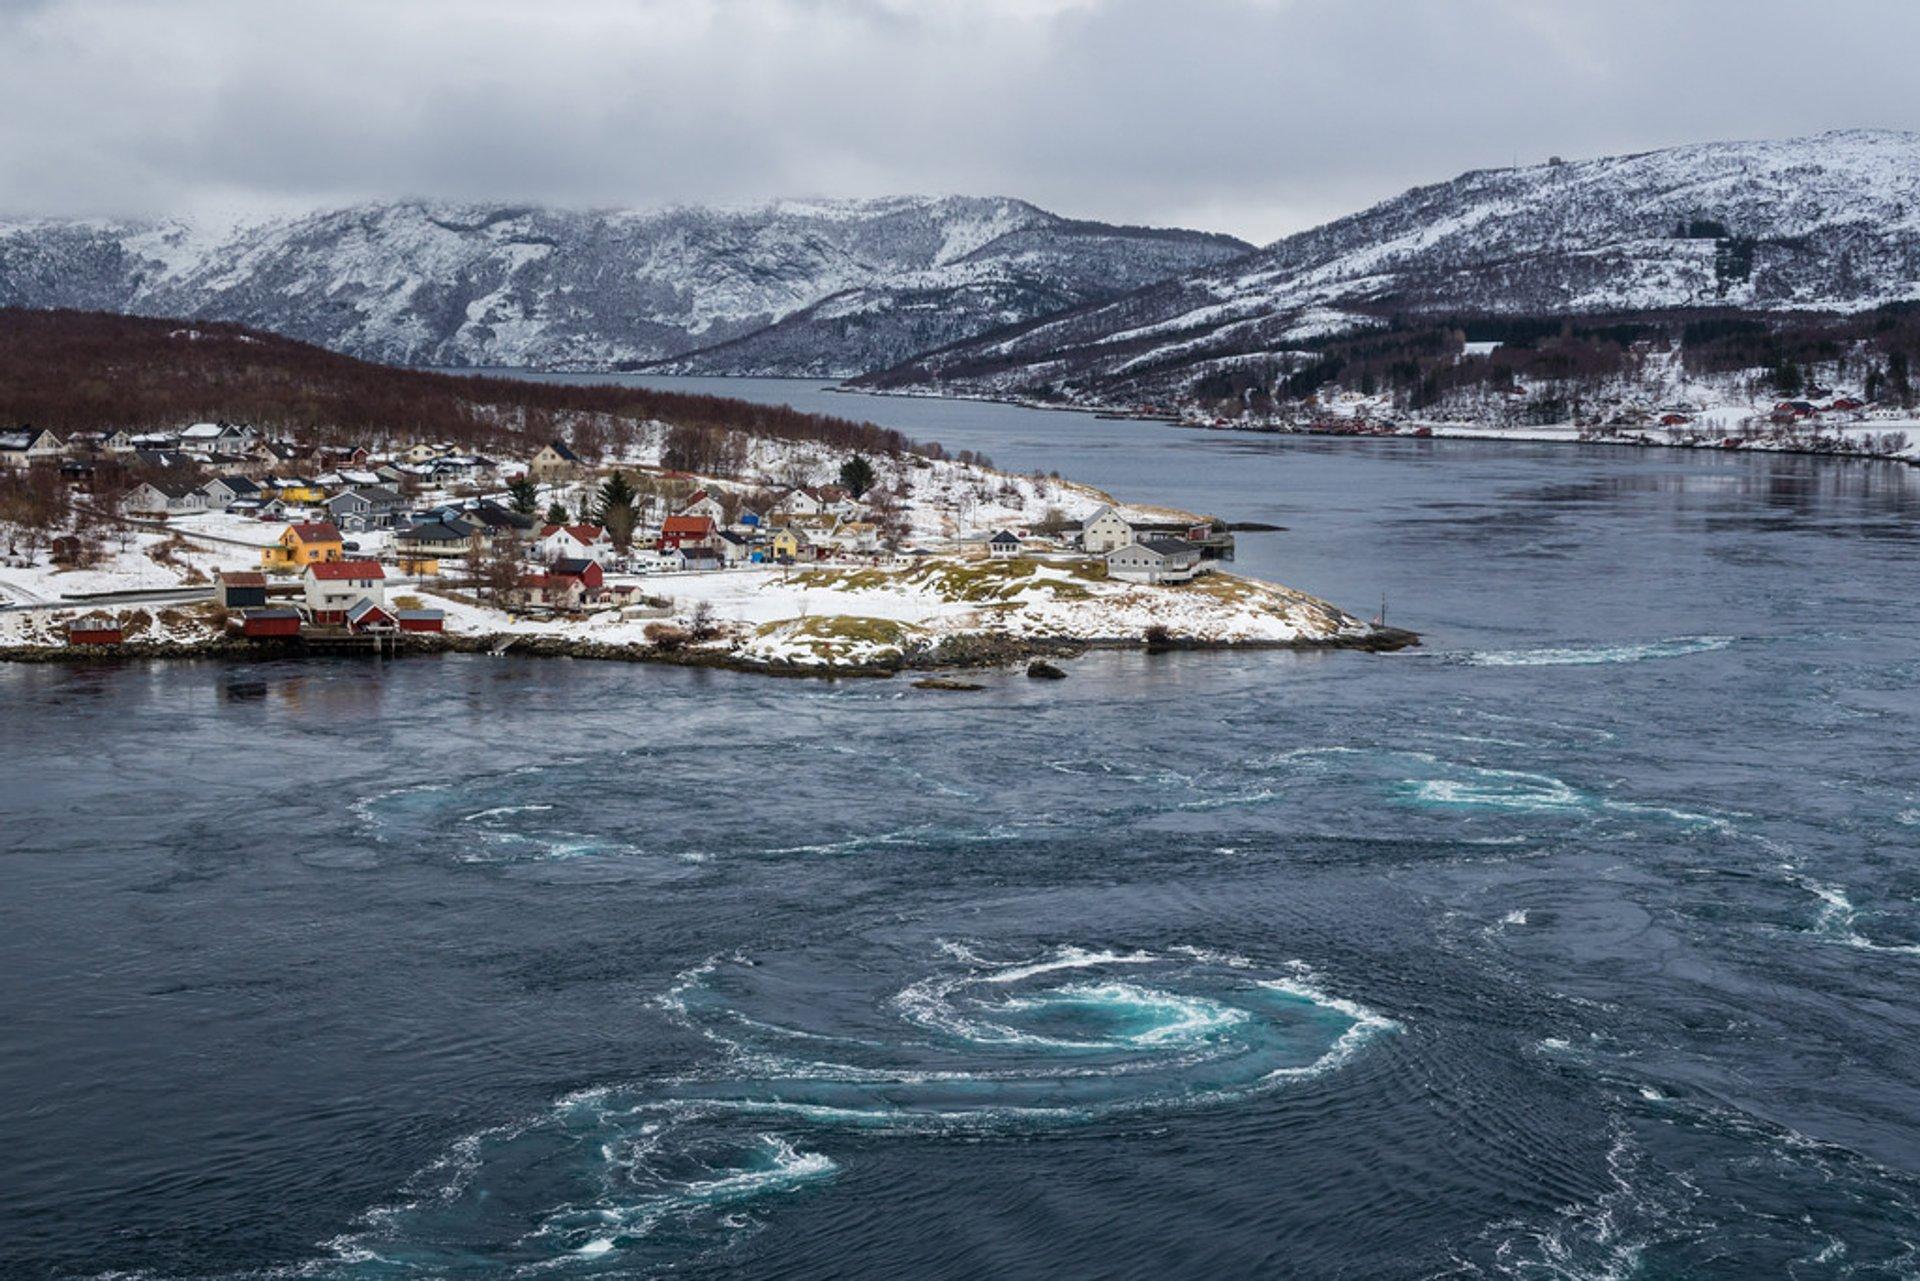 The Saltstraumen Maelstrom in Norway